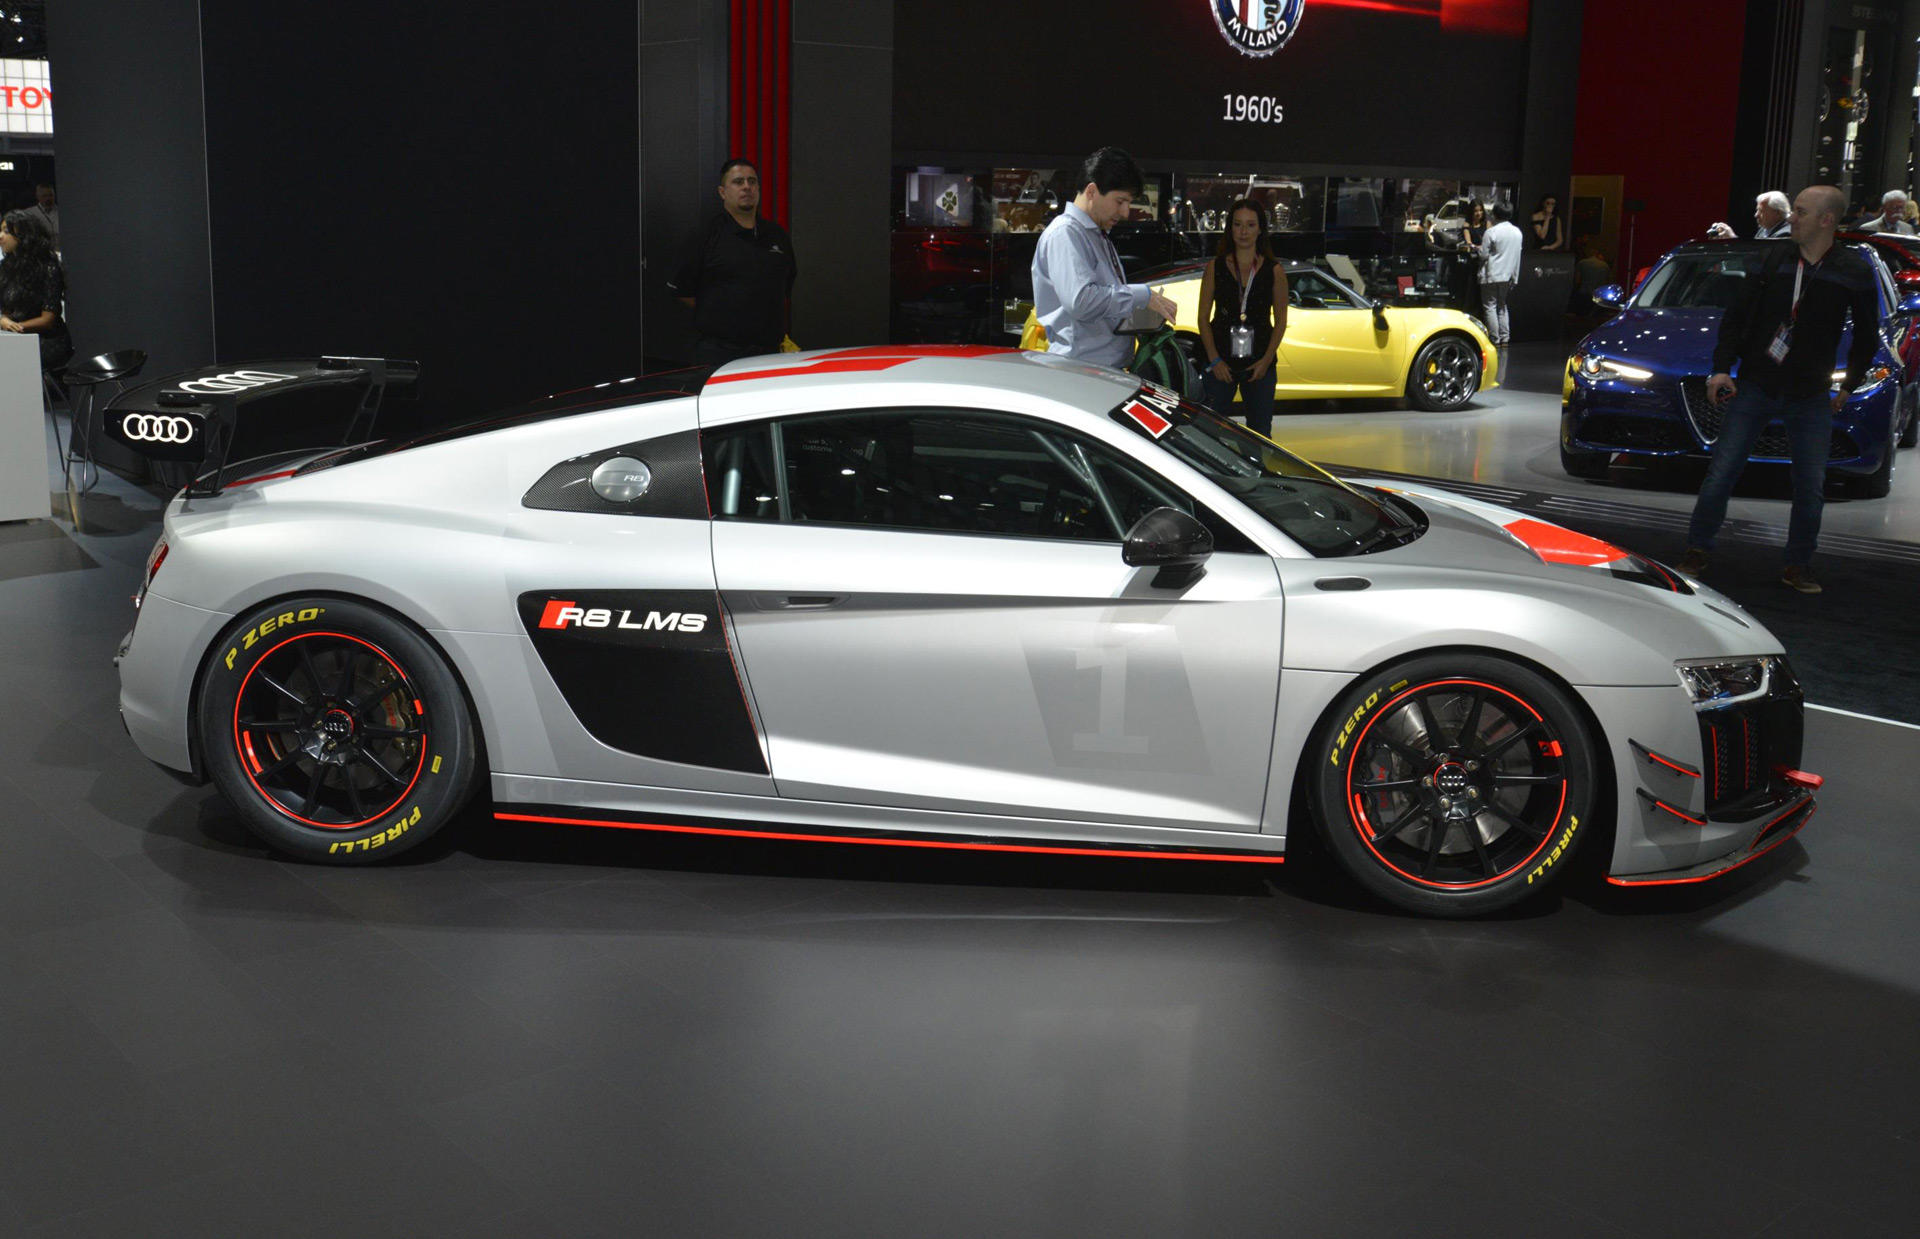 Audi adds a second R8 race car, the R8 LMS GT4